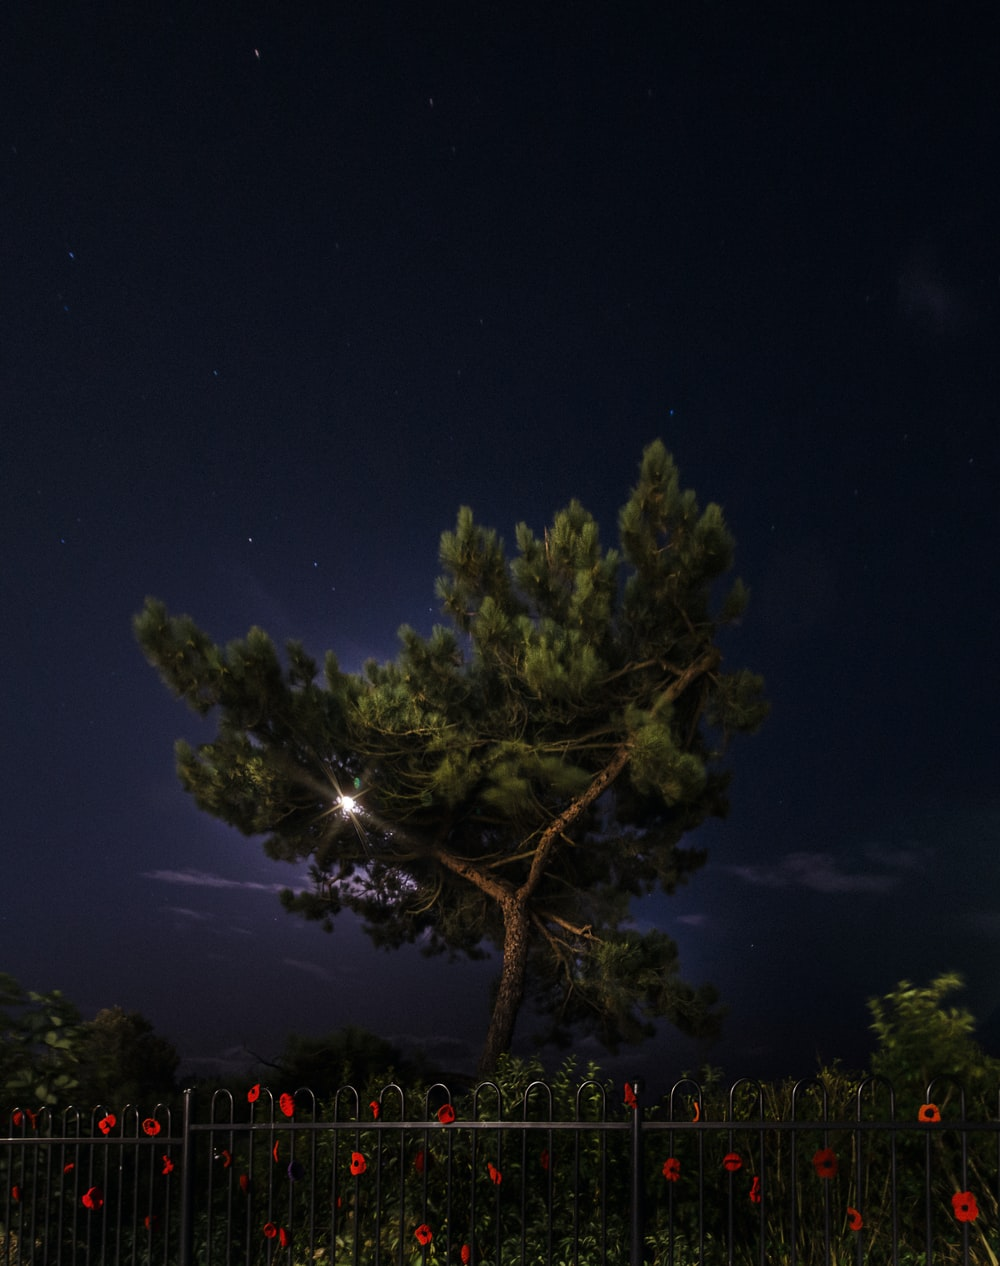 green tree during nighttime